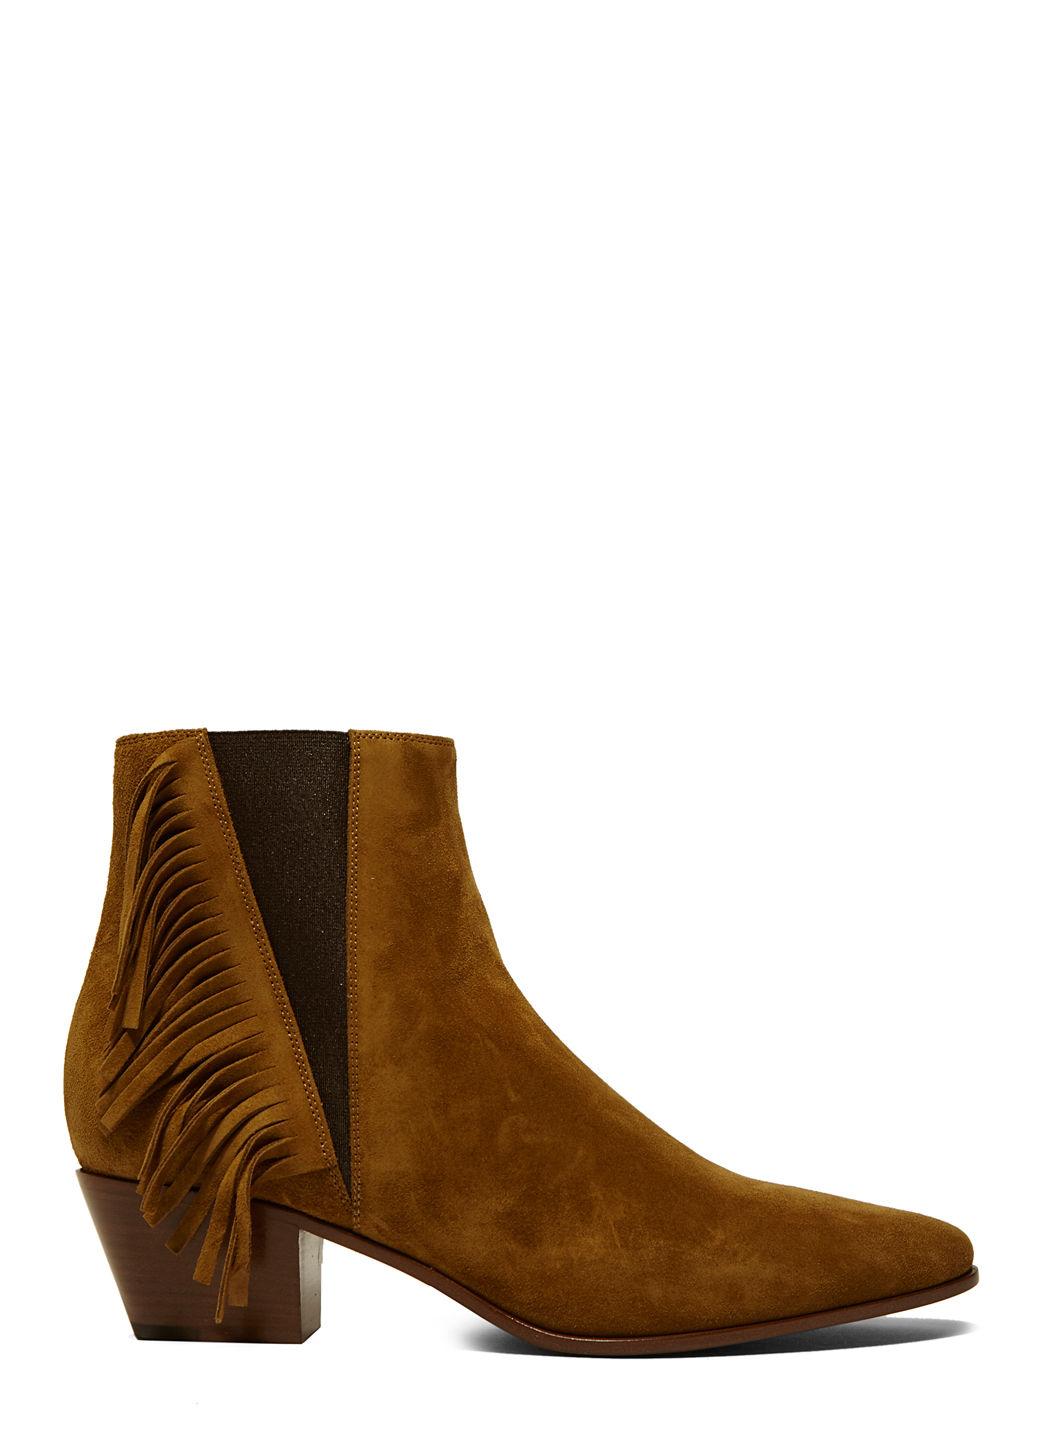 Women'S Tasselled Chelsea Boots In Brown, Nude & Neutrals